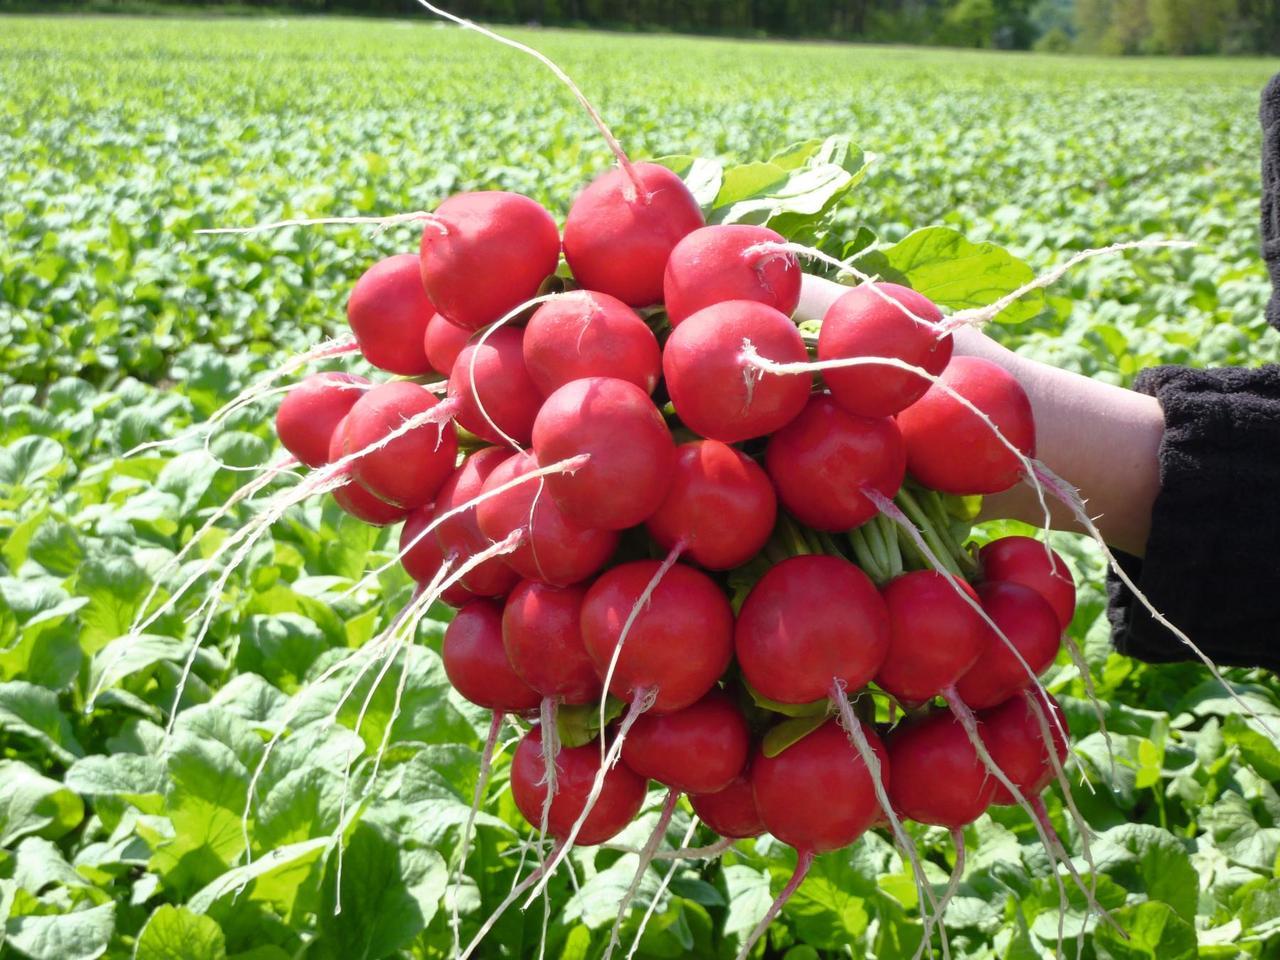 Розетта F1 - семена редиса, Bejo - 5 000 семян 2.25-2.50